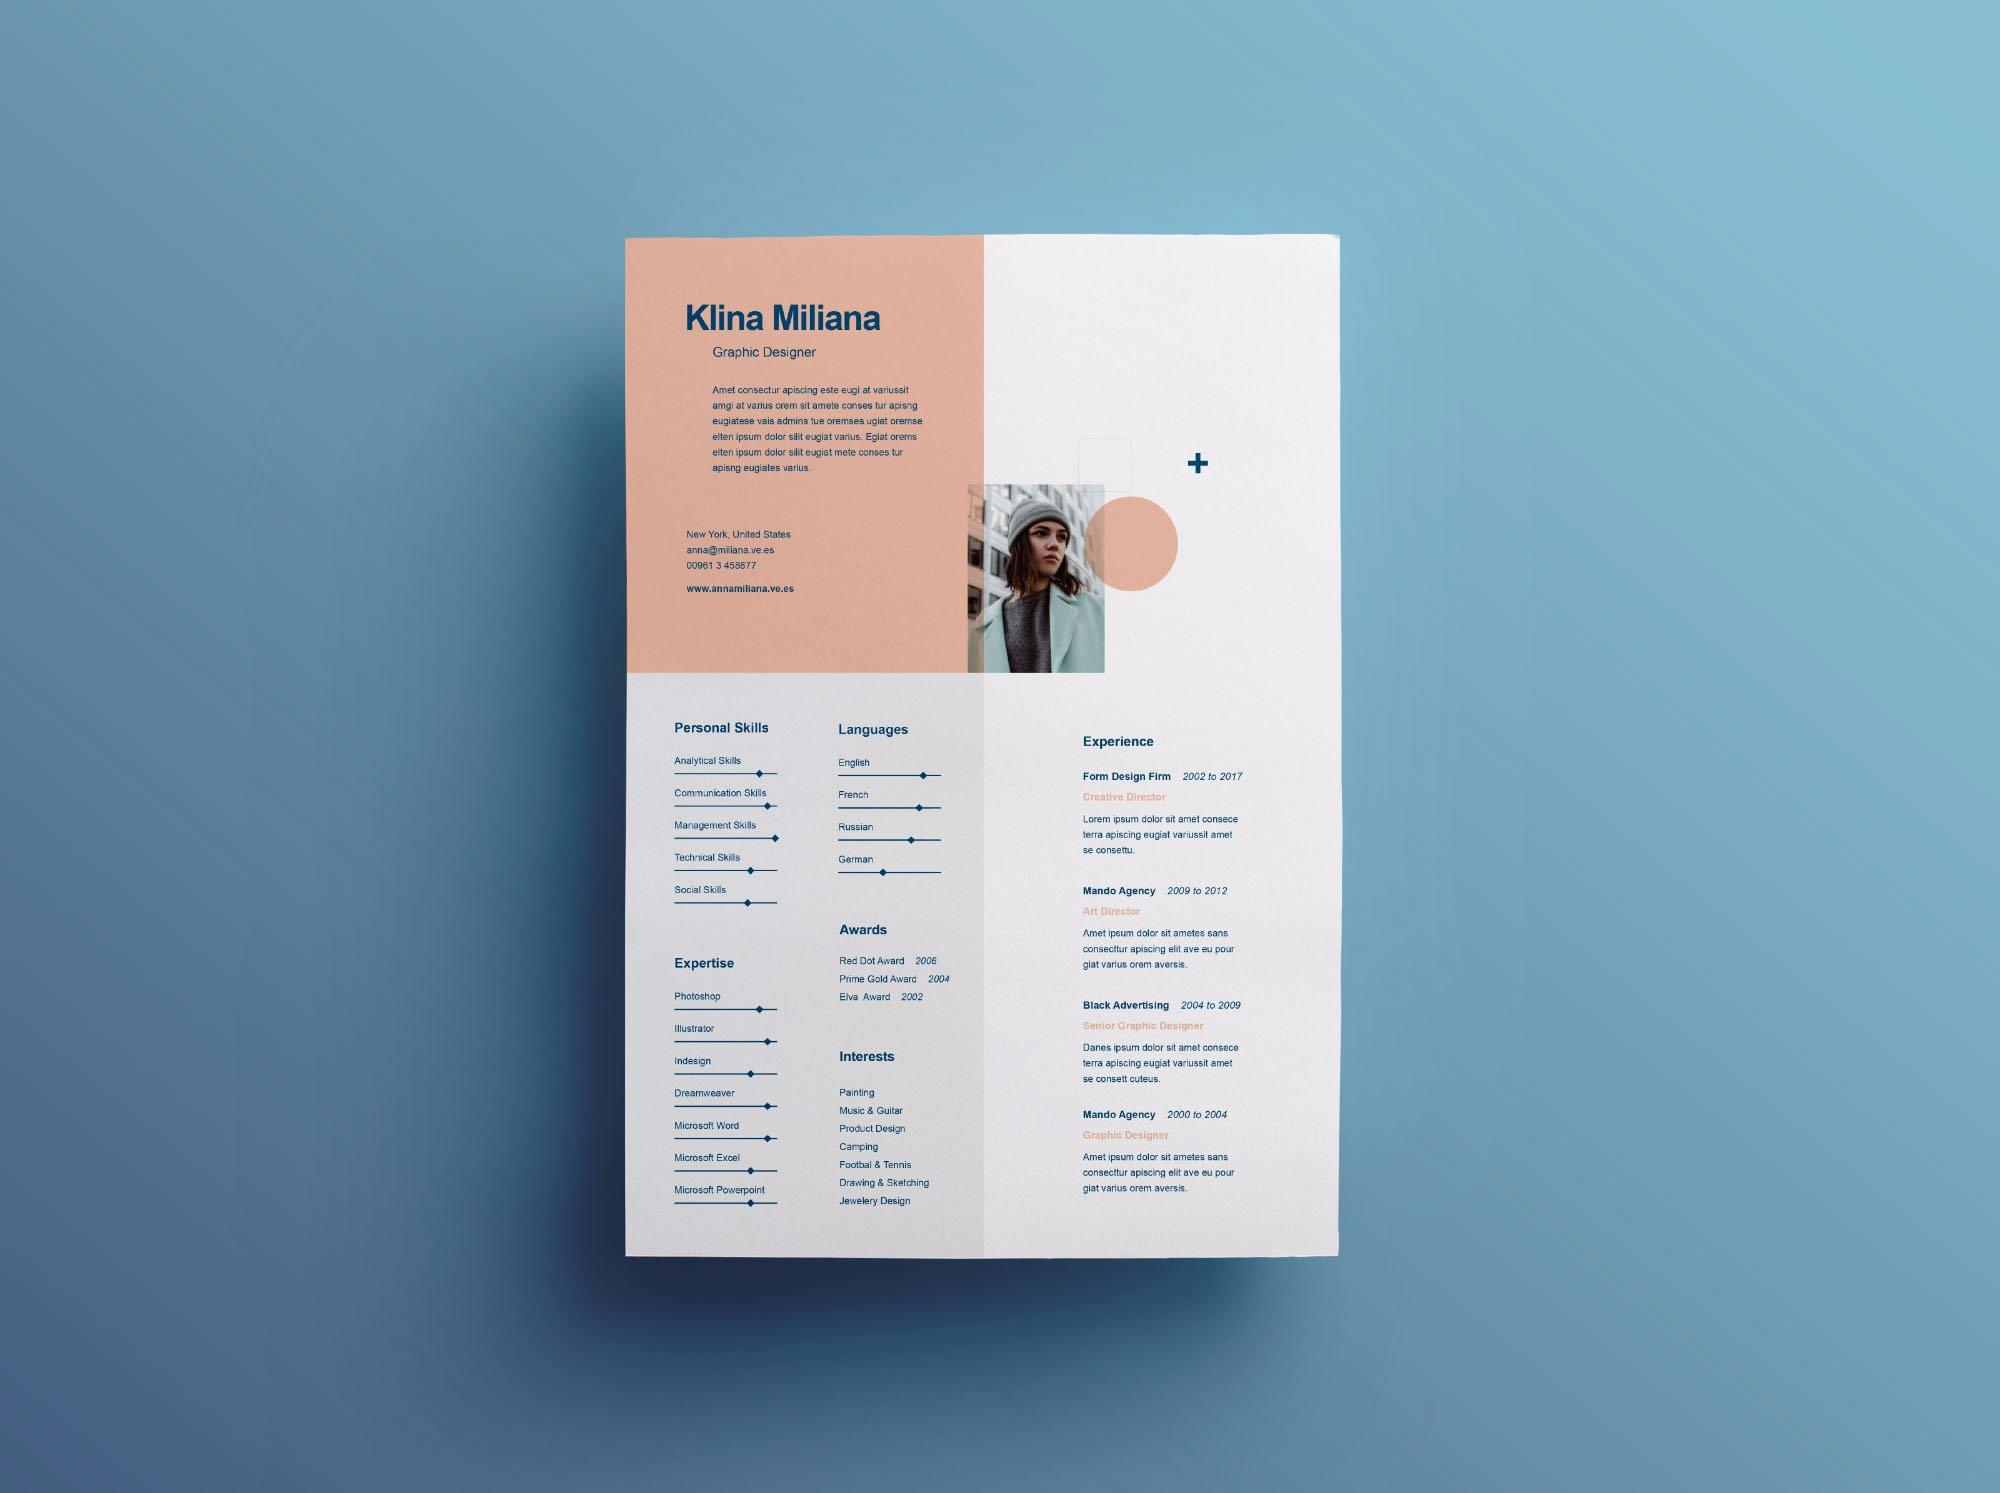 Graphic Designer Resume Pdf New Graphic Design Resume Templates Free Download Template Microsoft Word Pdf Indesign 2019 Designer